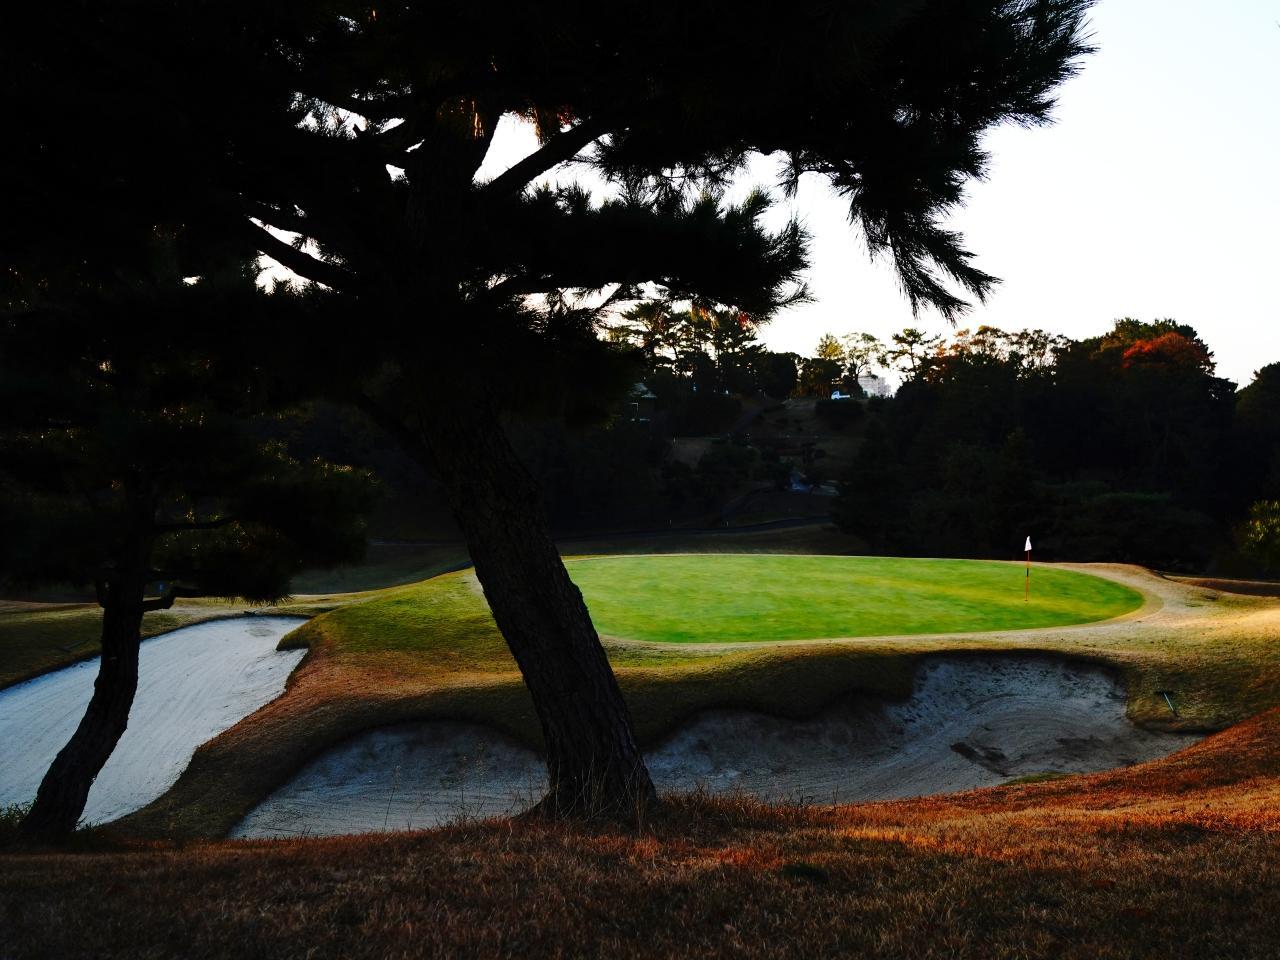 Images : 5番目の画像 - 垂水ゴルフ倶楽部 - ゴルフへ行こうWEB by ゴルフダイジェスト